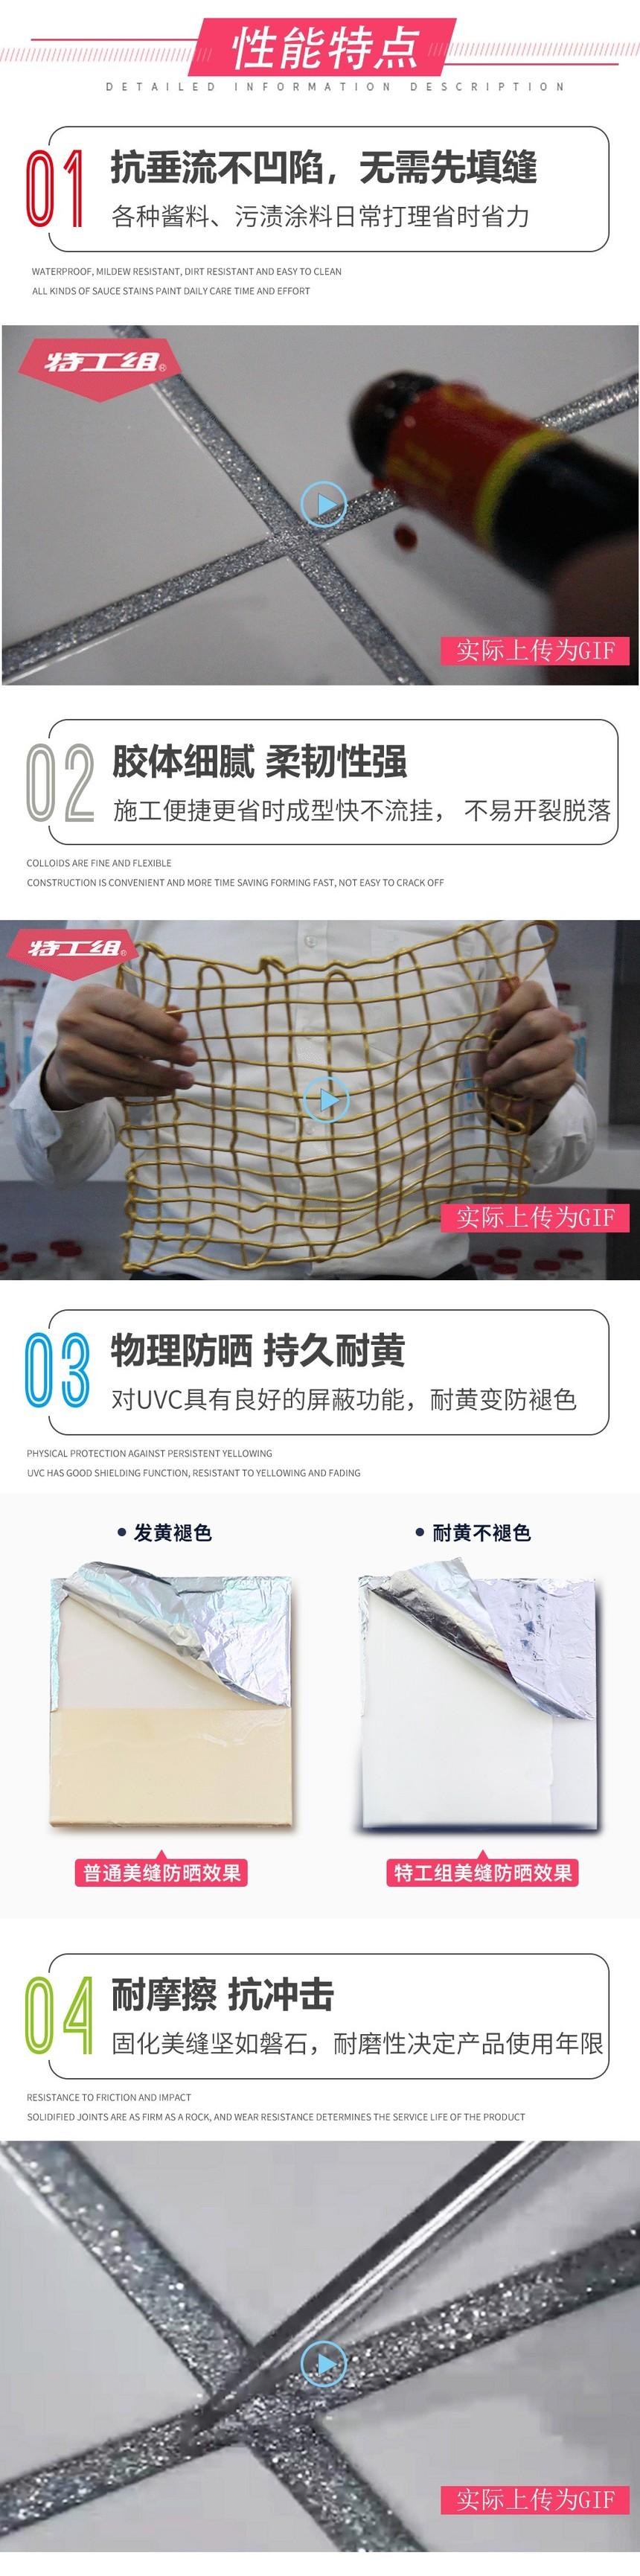 DIY美缝详情页-0603-定稿(1)_12.jpg